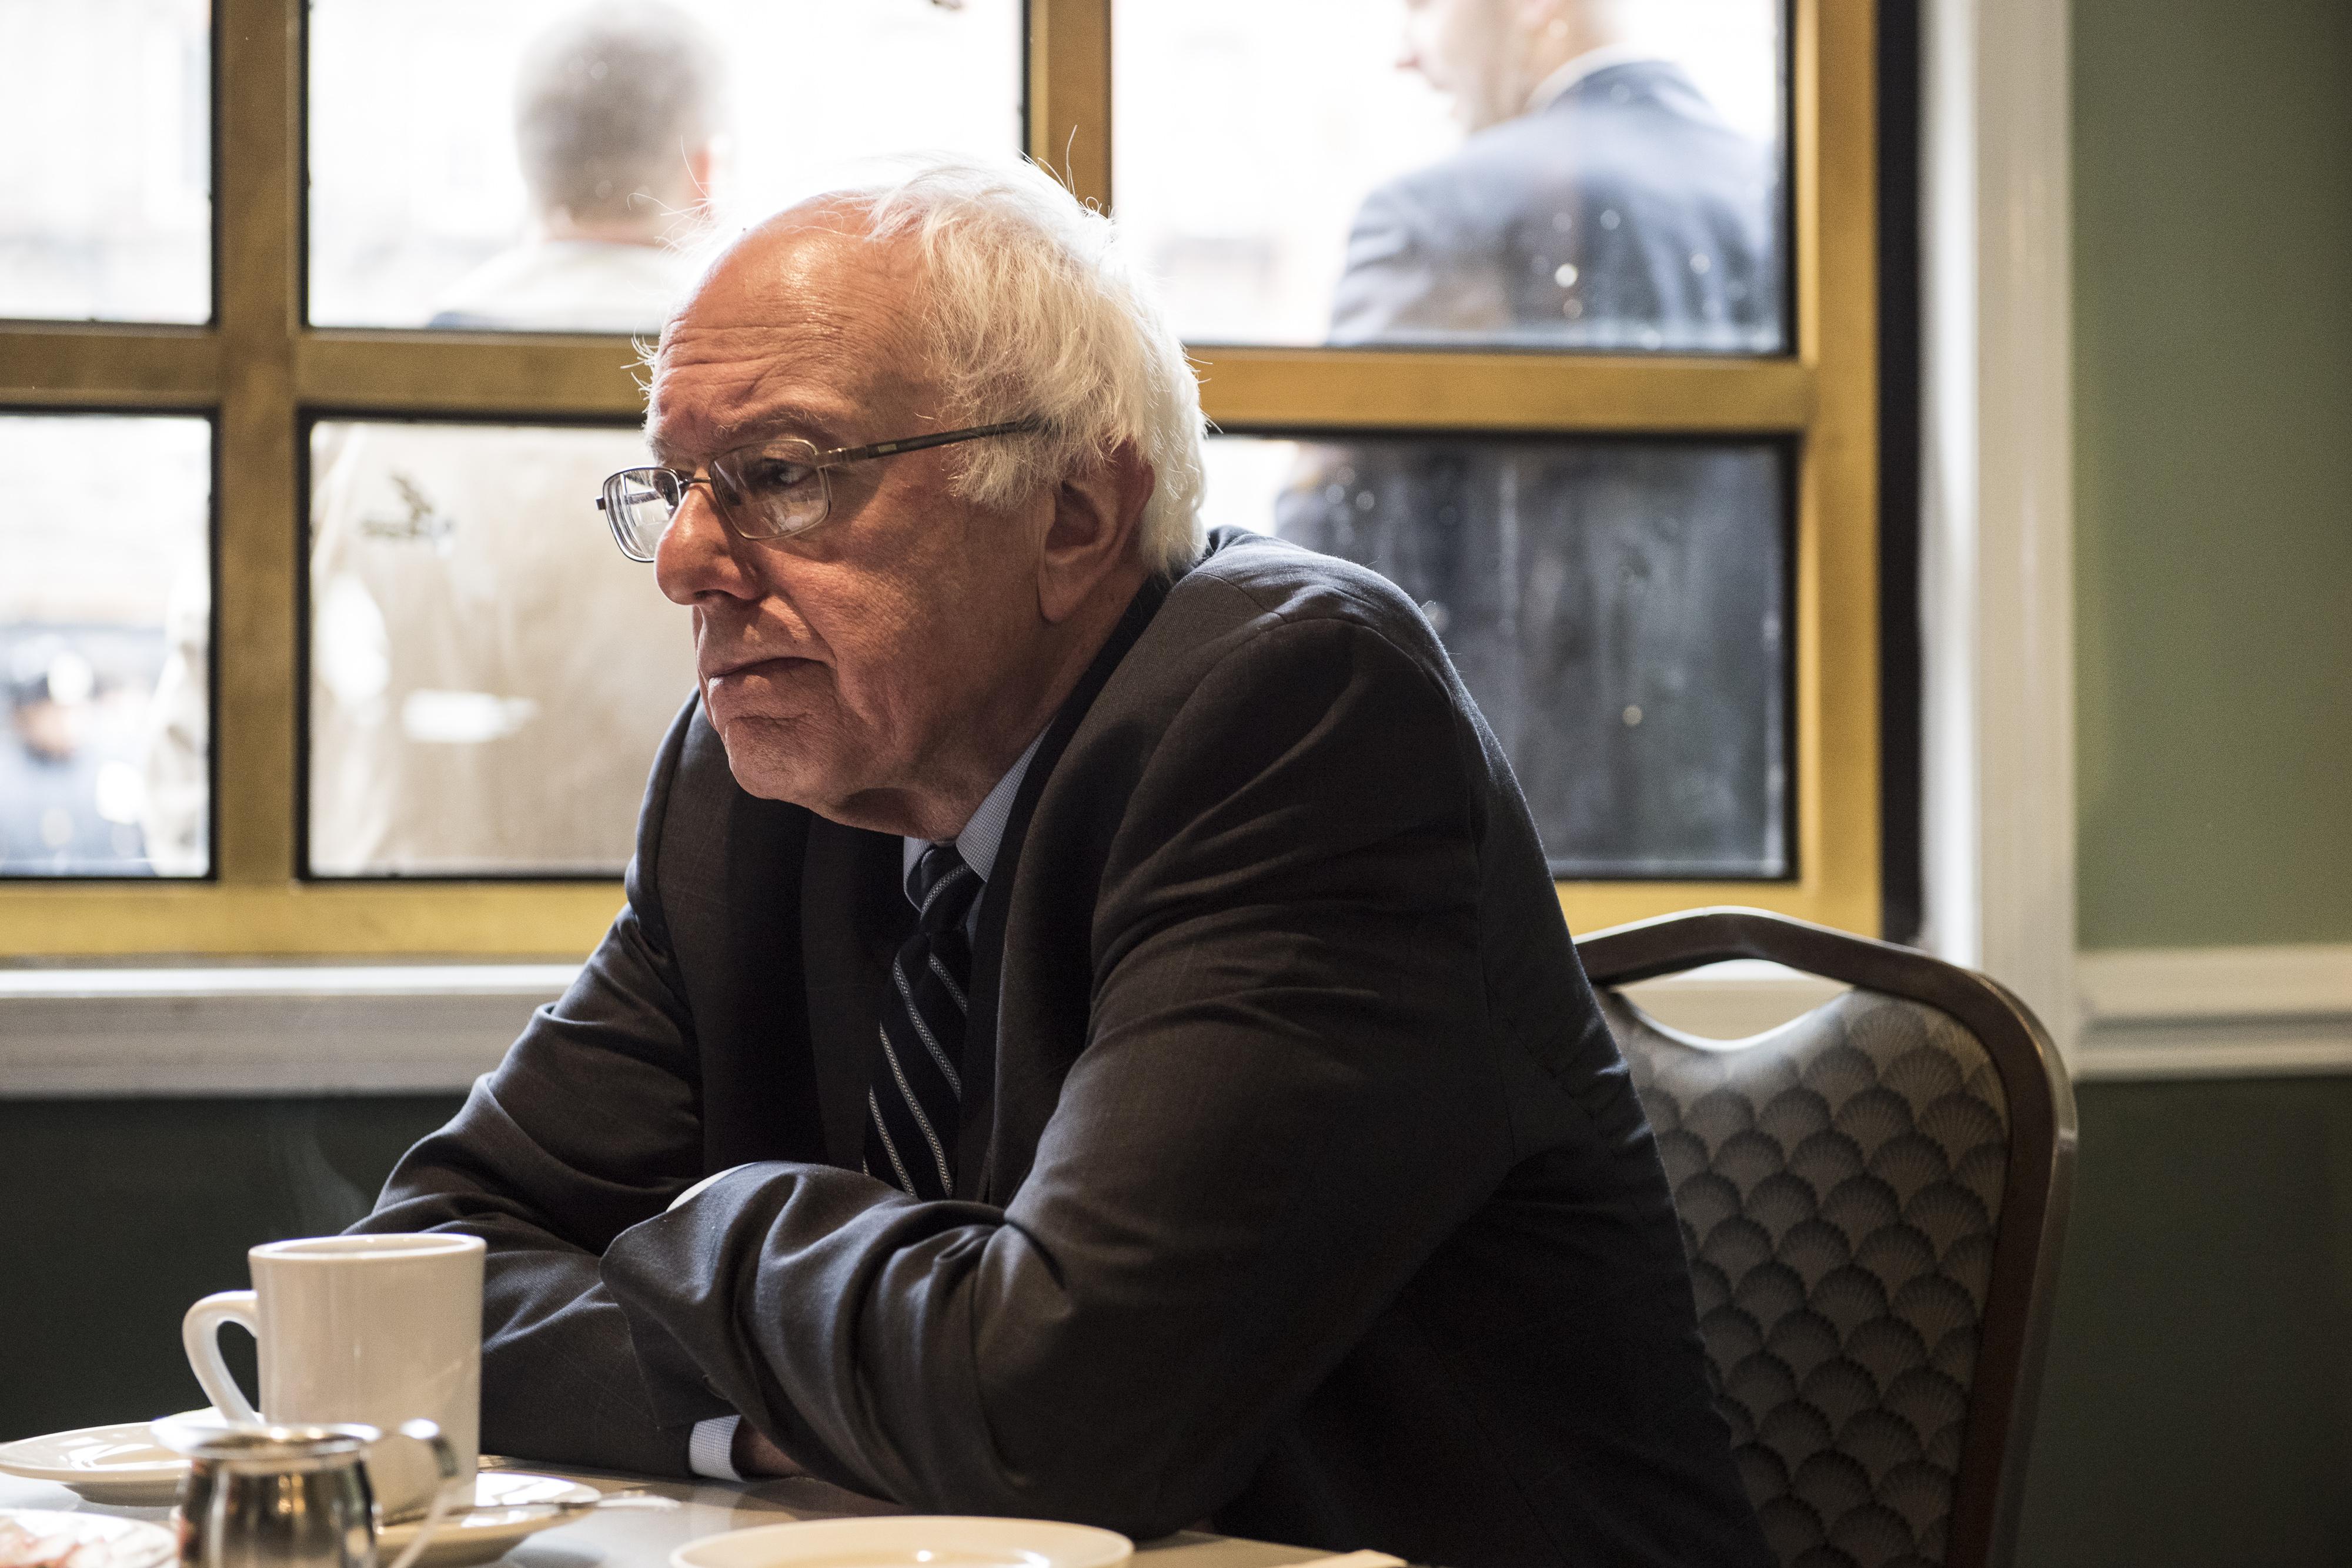 Sen. Bernie Sanders at Sylvia's Soul Food restaurant in Harlem.